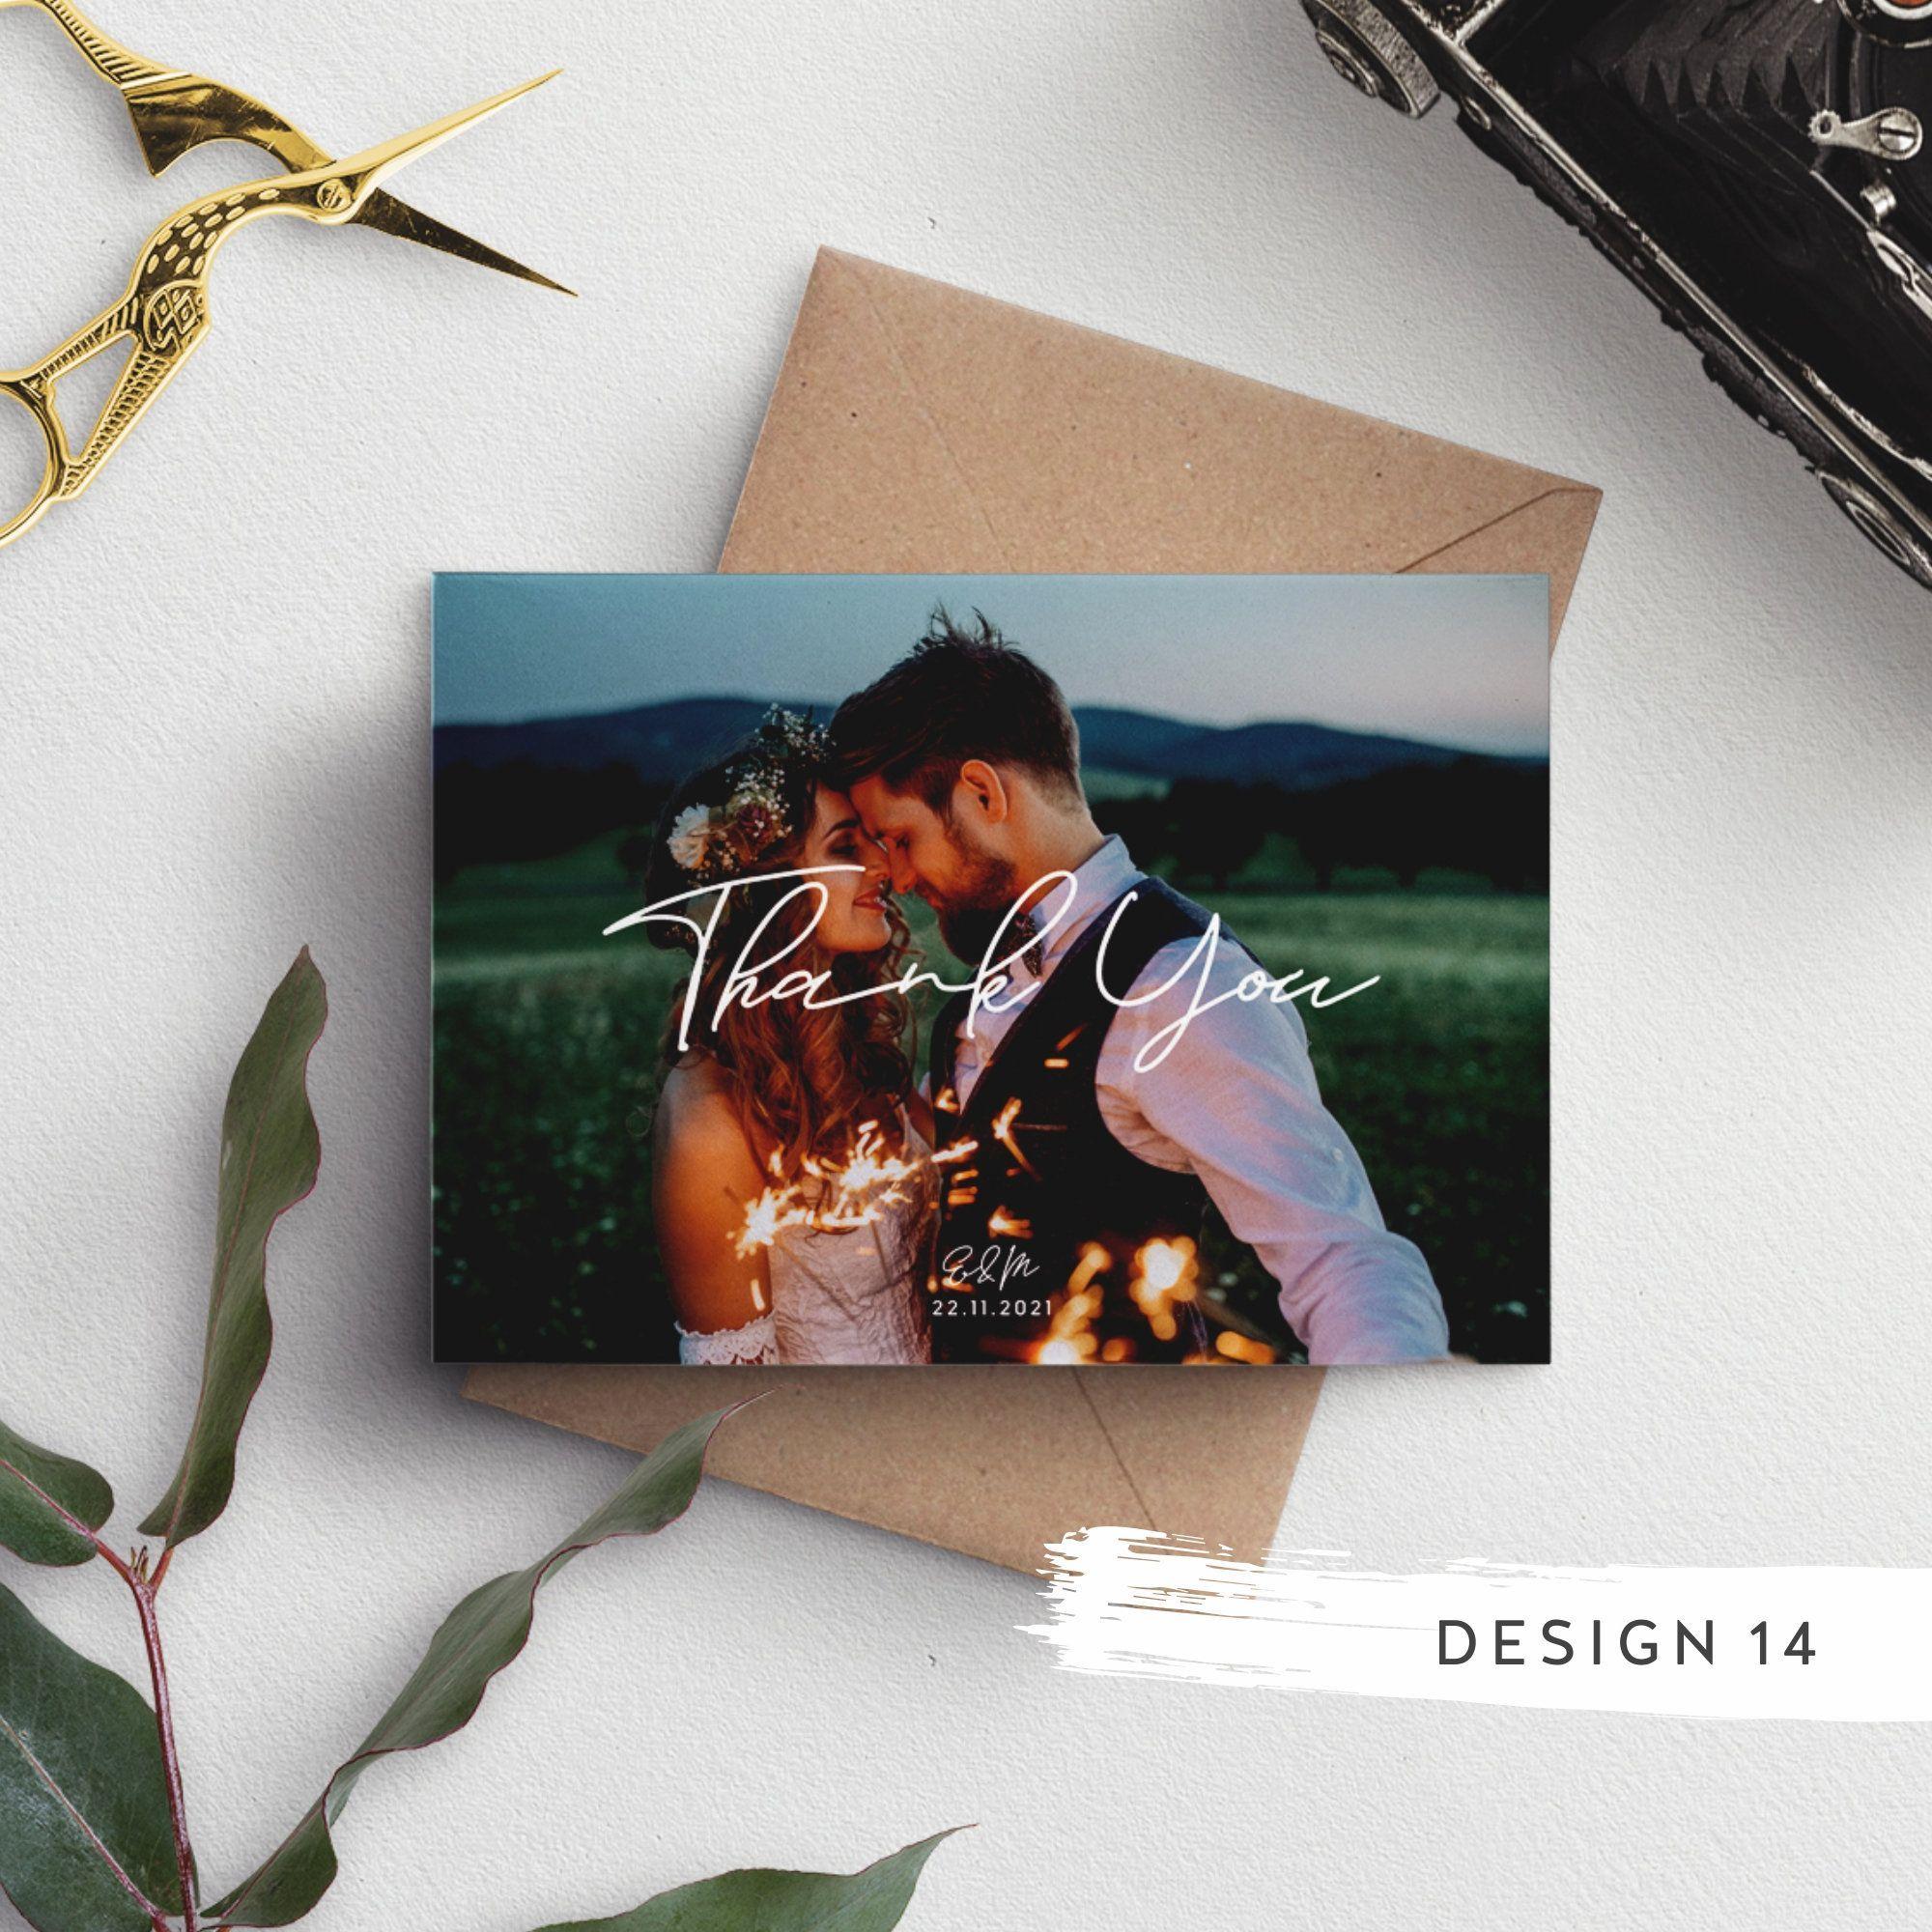 Thank You Wedding Cards, Photo Thank You Card,  Thank You Card Wedding, Thank You Cards With Envelopes, Personalised Thank You Cards #087#card #cards #envelopes #personalised #photo #wedding